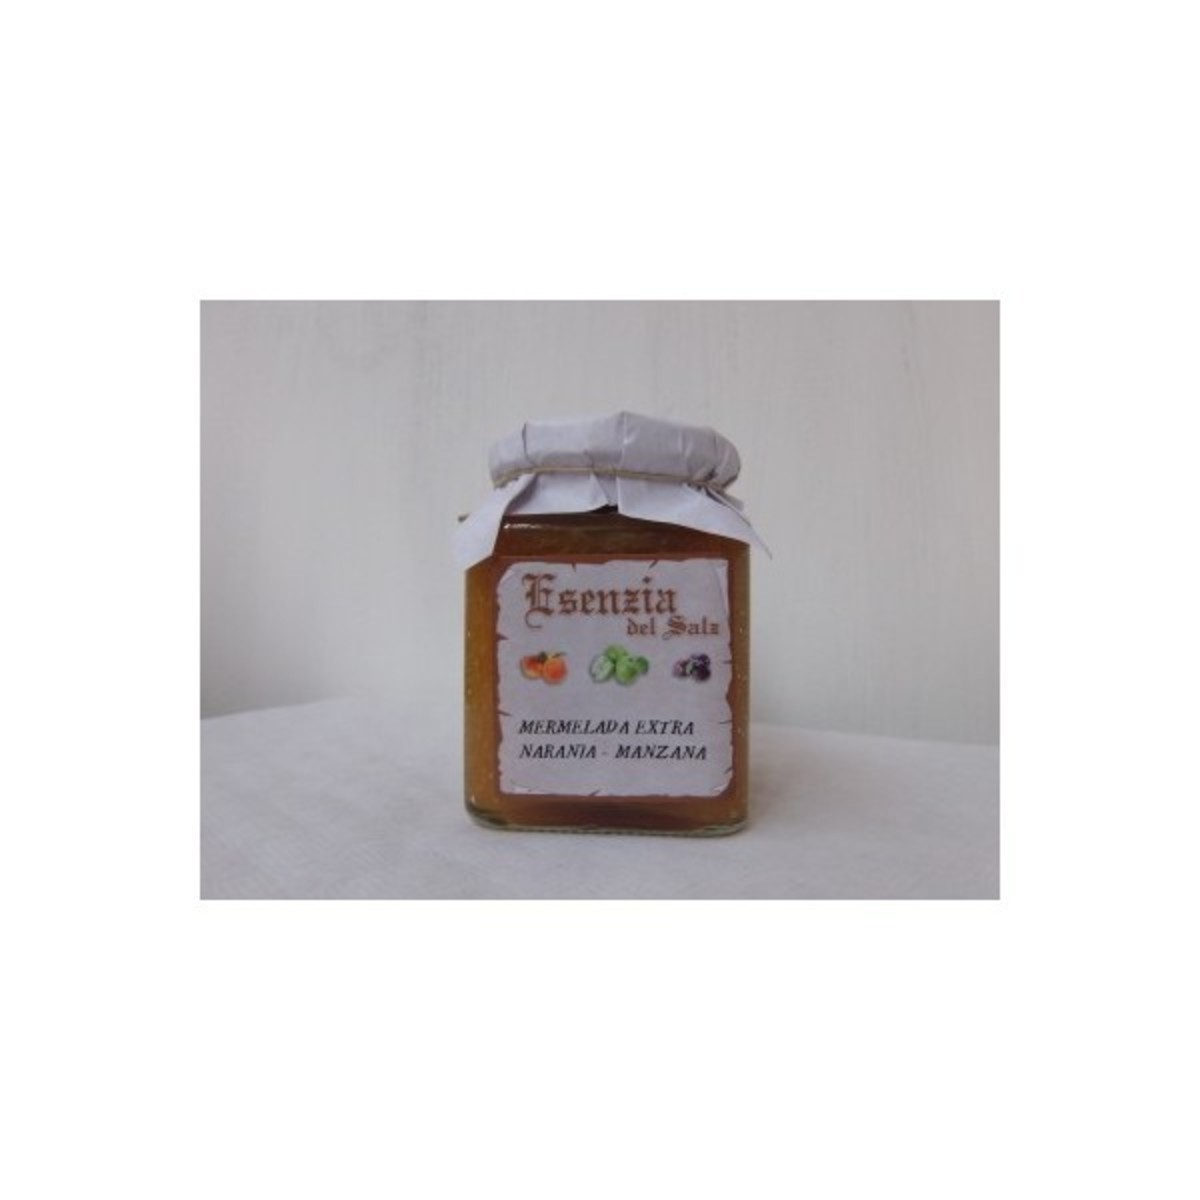 Mermelada Extra de Naranja-Manzana Esenzia del Salz